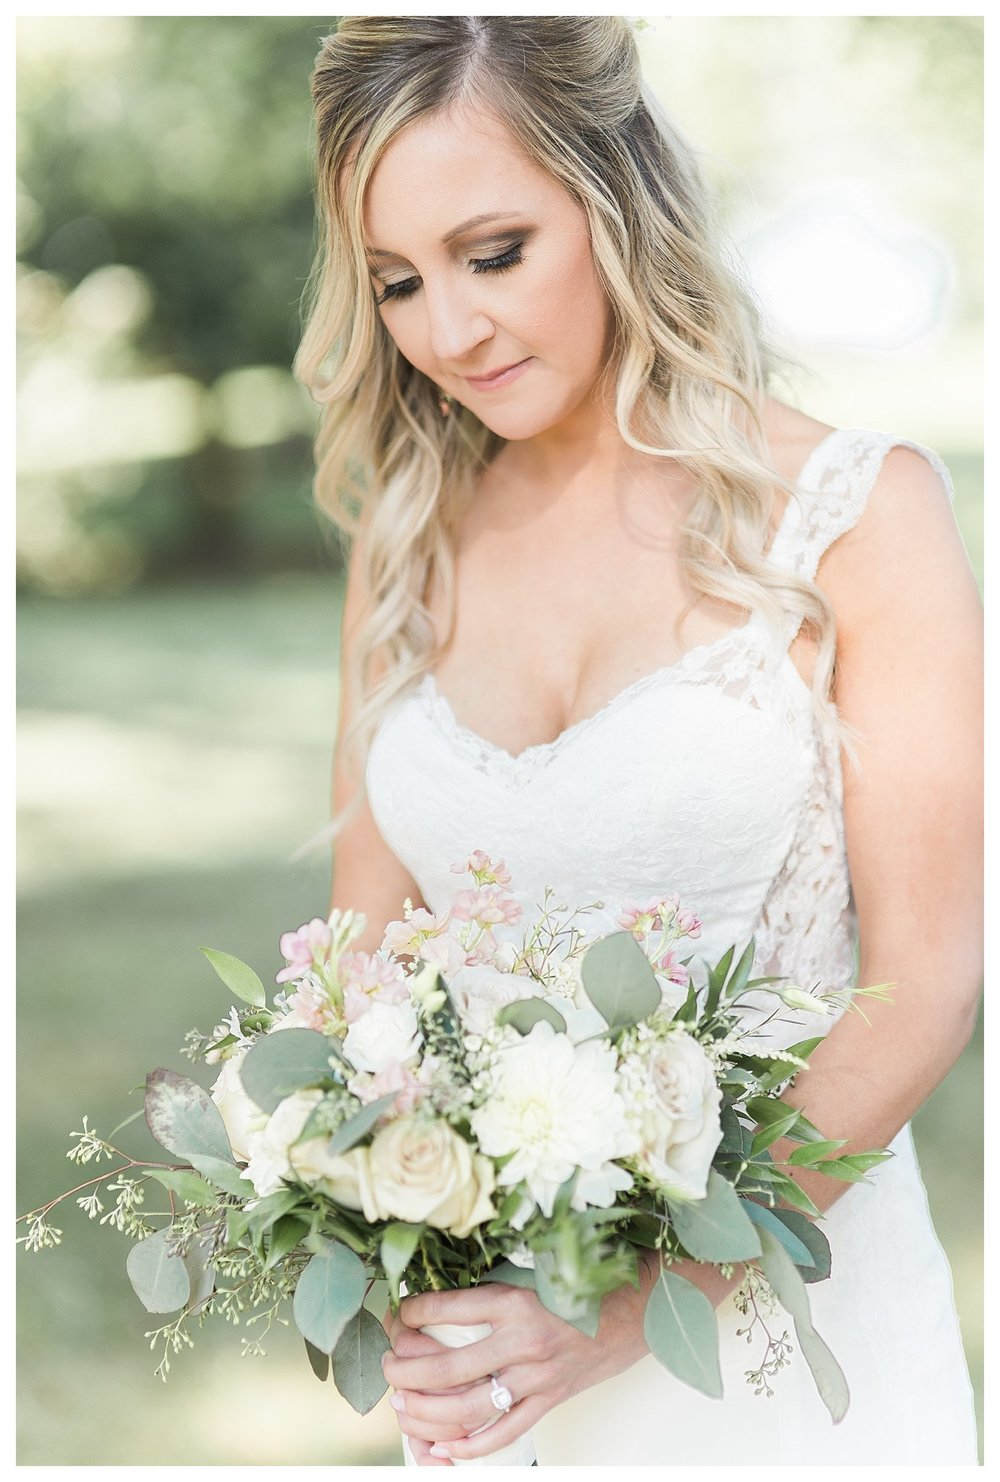 rhinegeist-wedding-everleigh-photography-cincinnati-wedding-photographer-the-singhoff-wedding-35